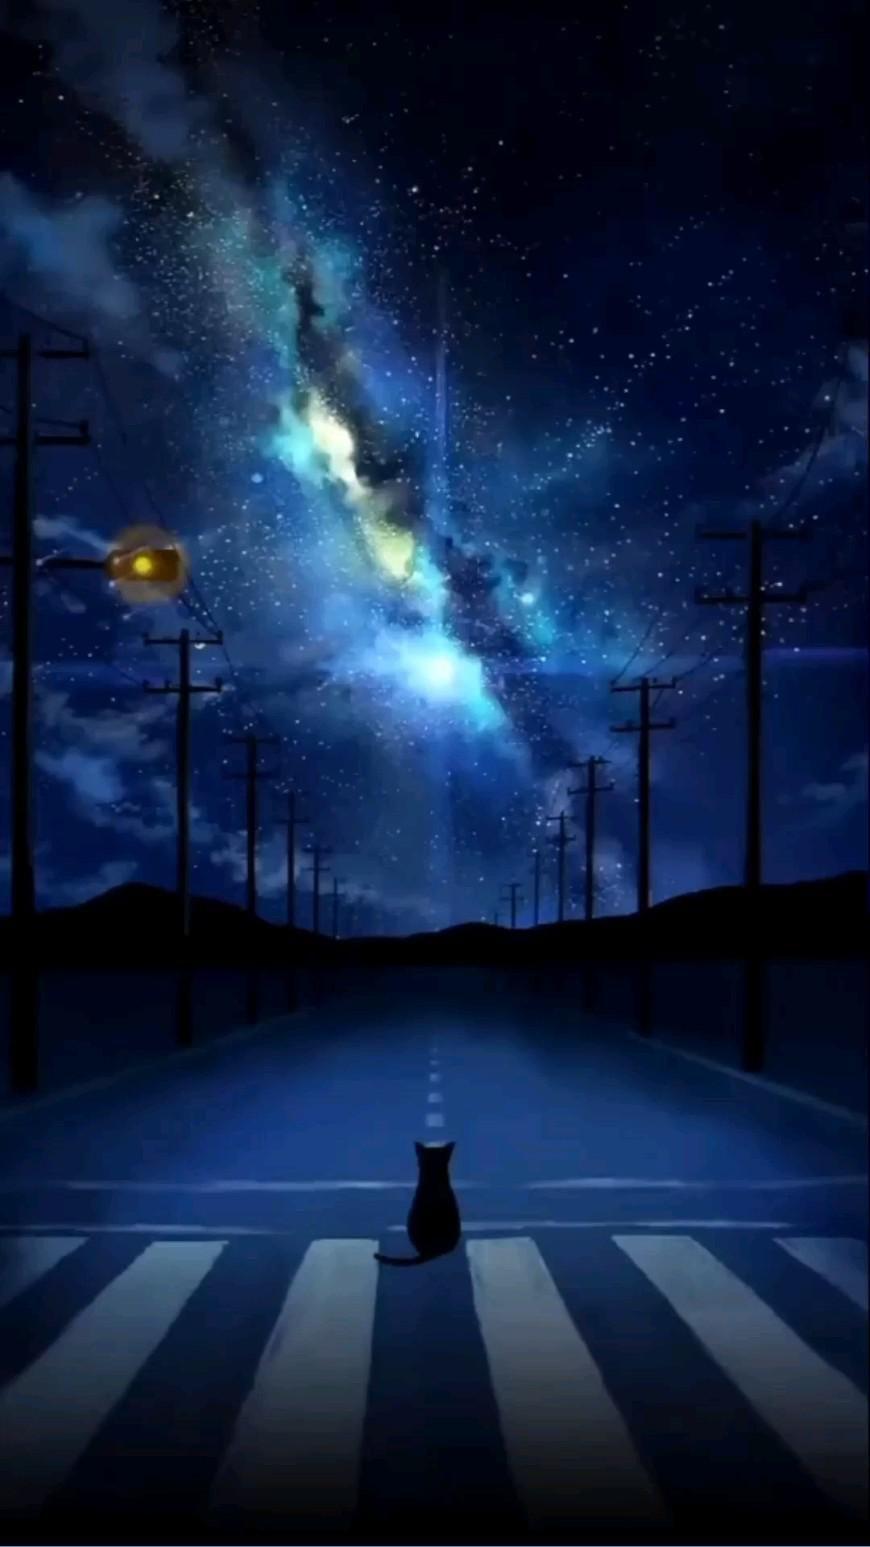 Galaxy / Starry Night